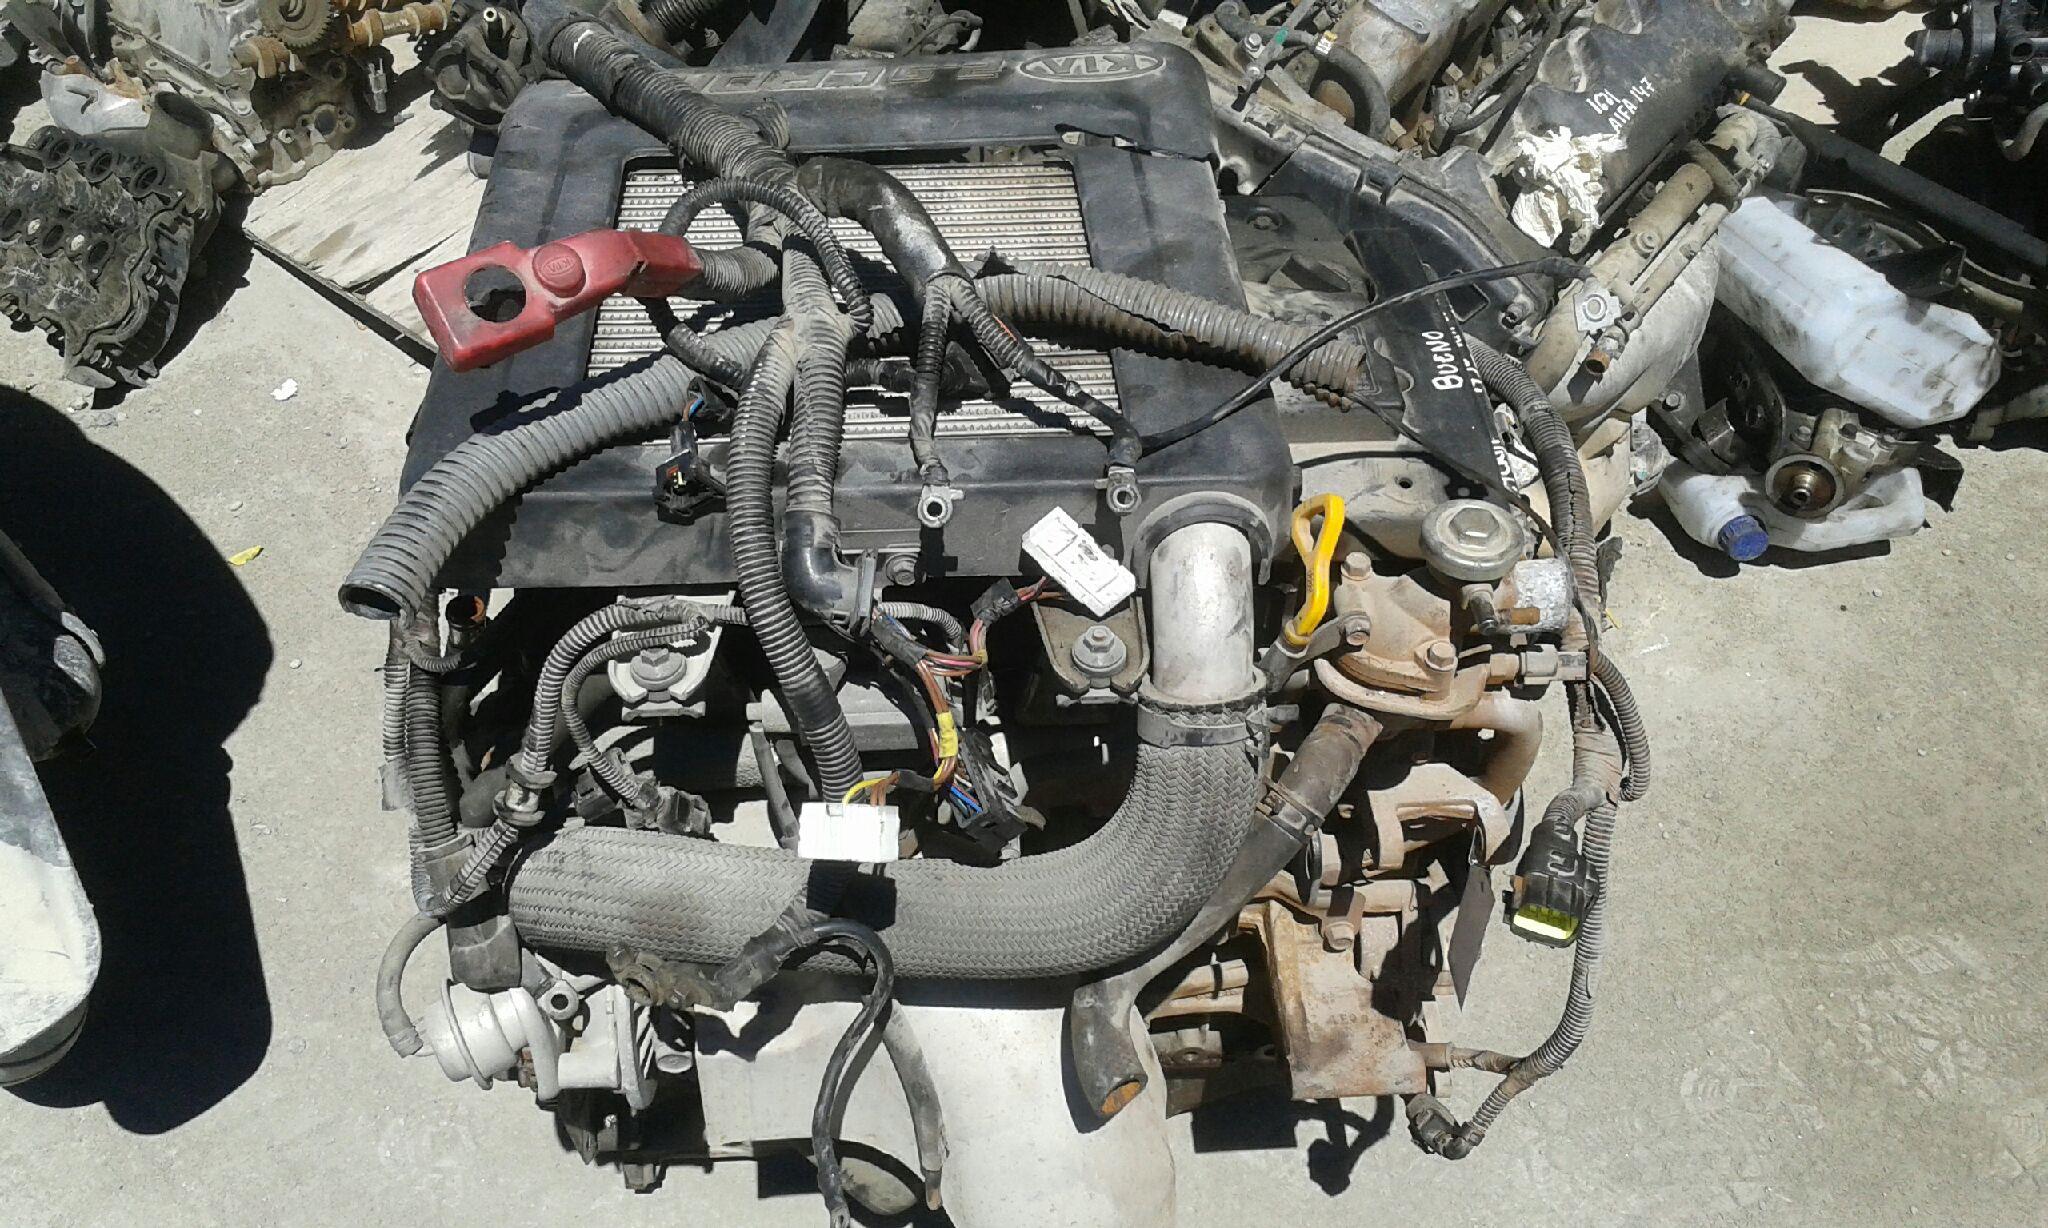 Motor completo de Kia Carnival ii (2001 - 2006) J3670603